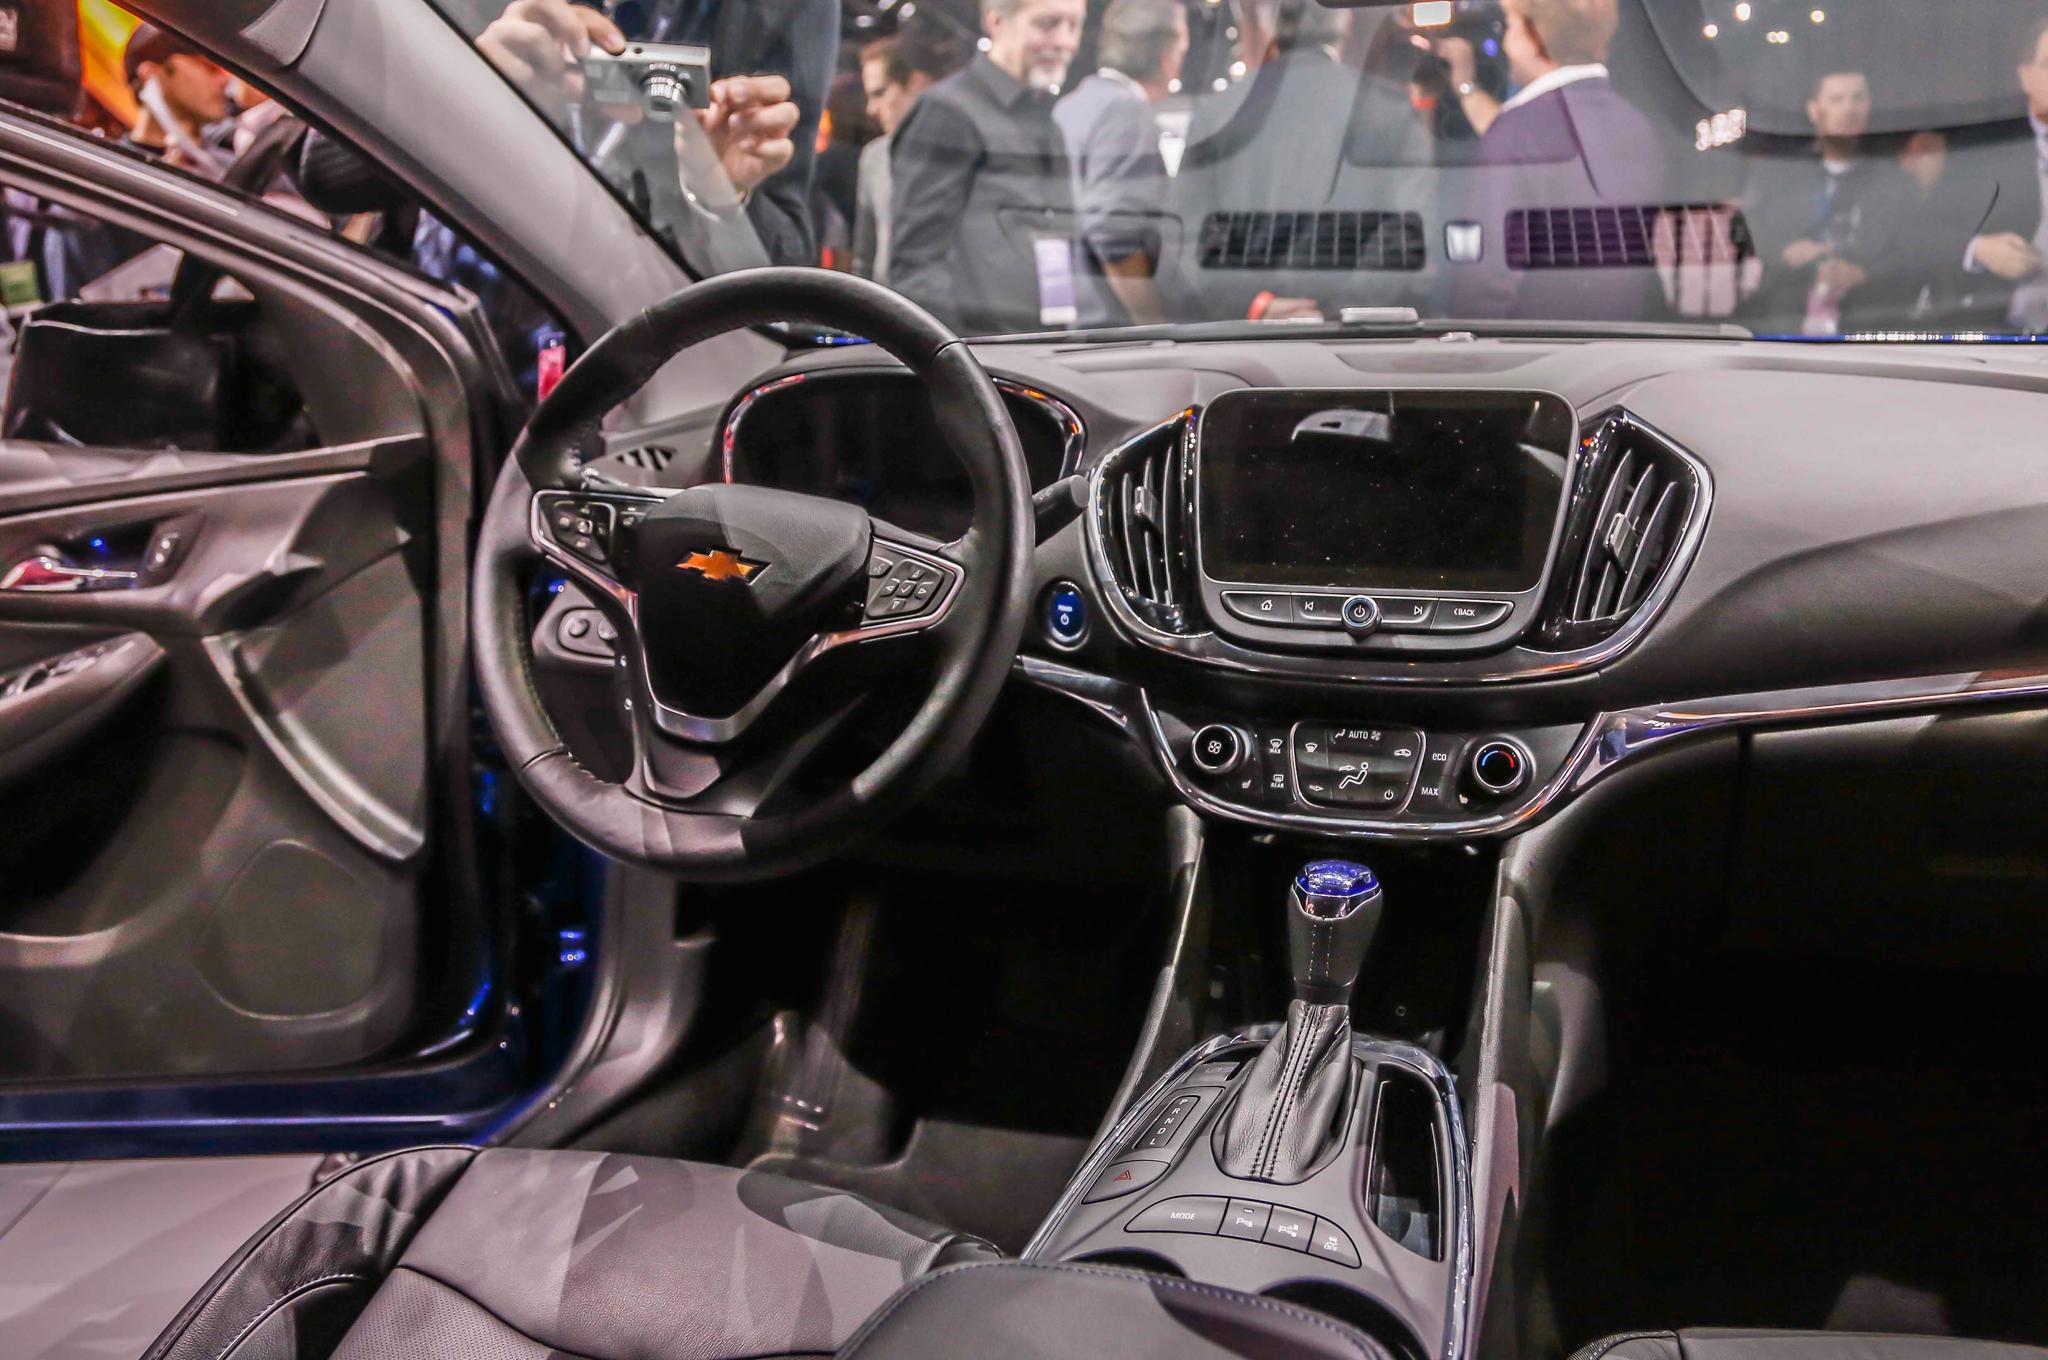 2016 Chevrolet Volt Cockpit and Dashboard